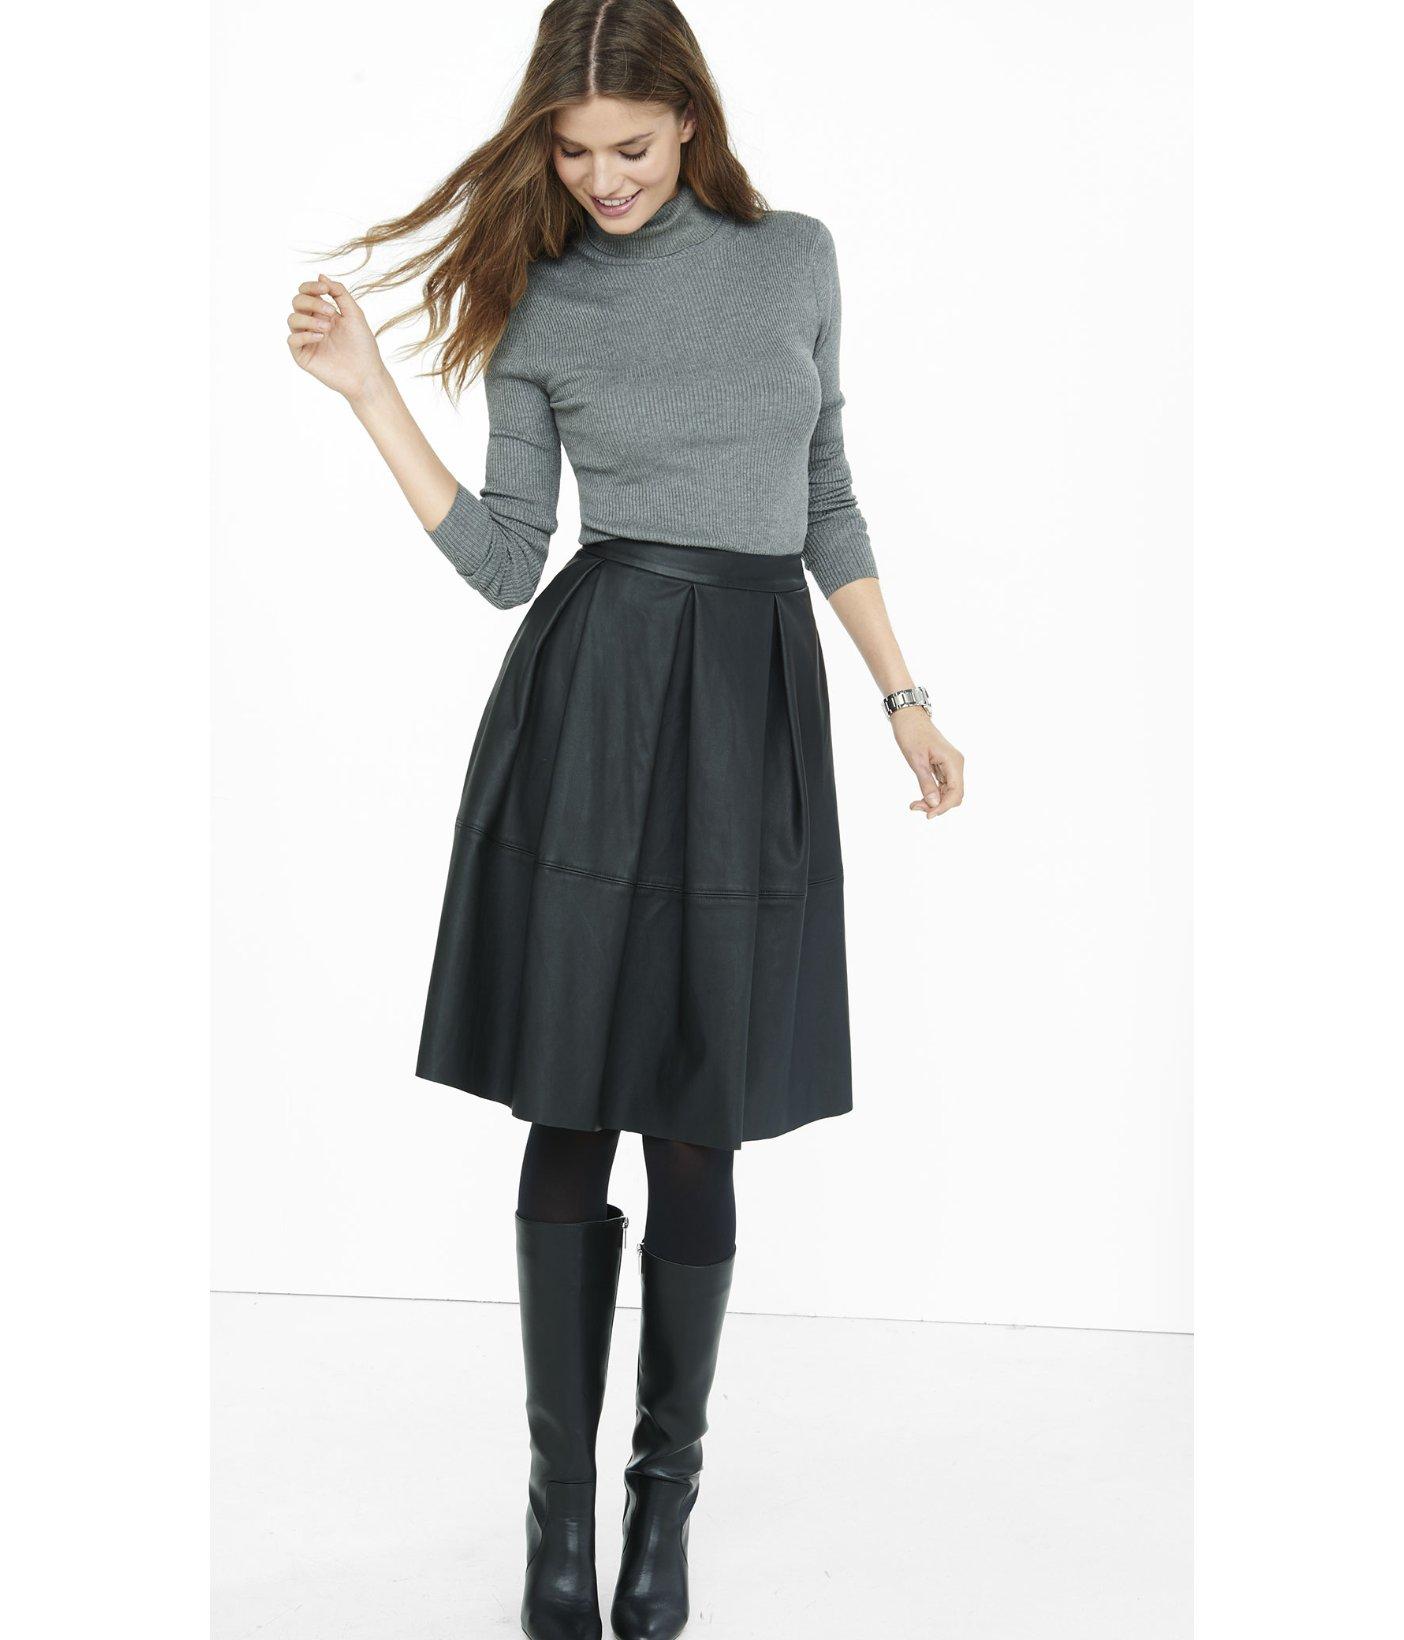 Express Black (minus The) Leather Full Midi Skirt in Black | Lyst